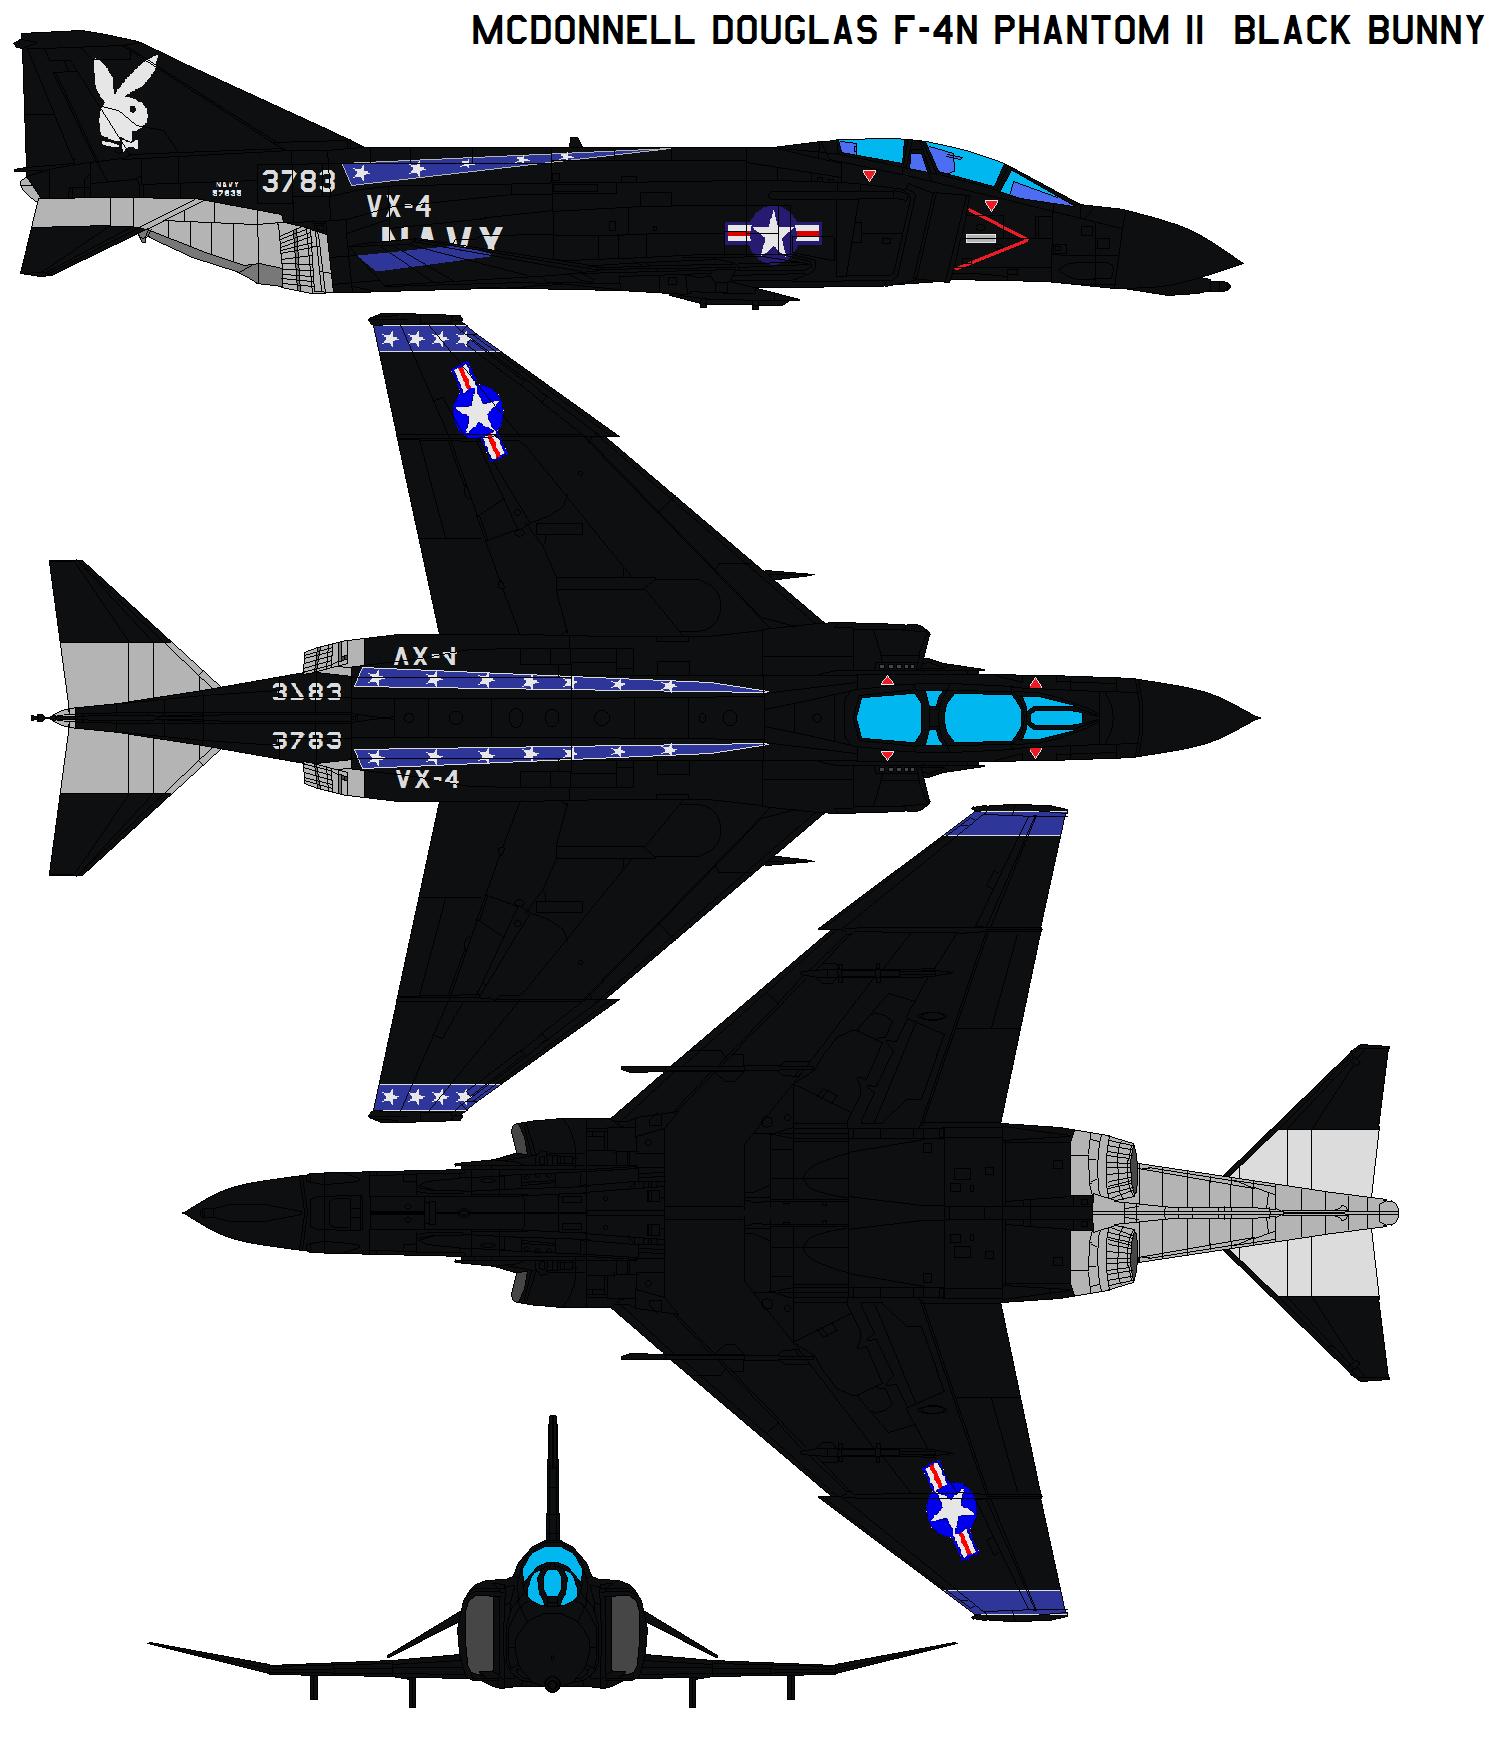 F-4N Phantom II Black Bunny By Bagera3005 On DeviantArt